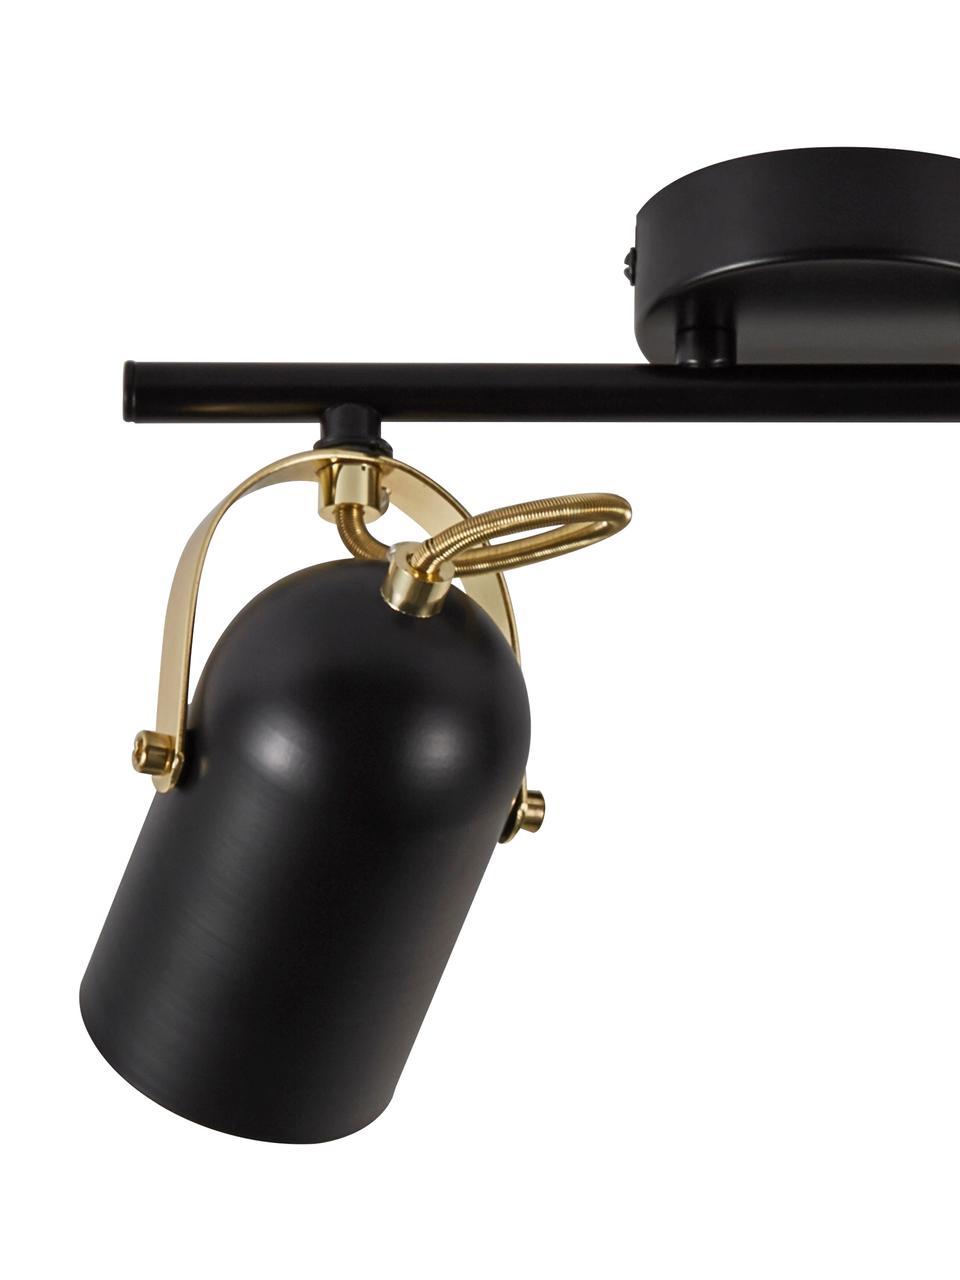 Retro-Deckenstrahler Lotus, Lampenschirm: Metall, beschichtet, Dekor: Metall, beschichtet, Baldachin: Metall, beschichtet, Schwarz, Messingfarben, 35 x 19 cm